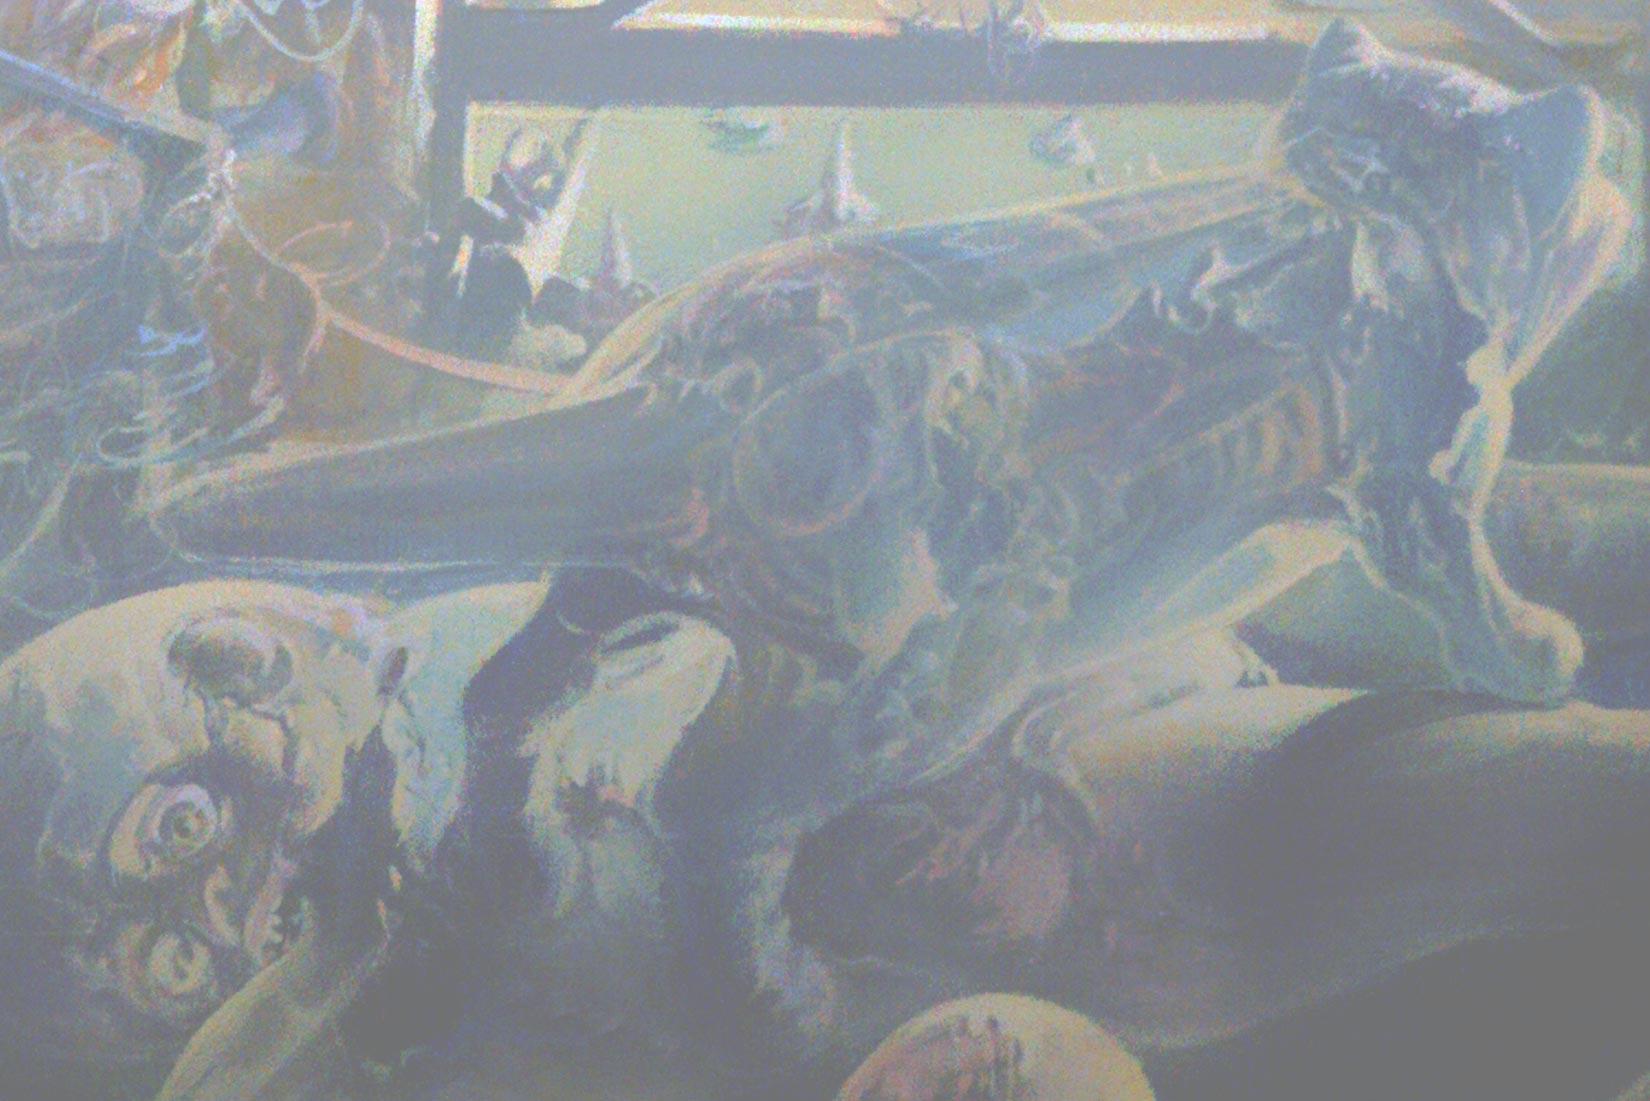 Dadova slika Atelje, 1972 (detalj)